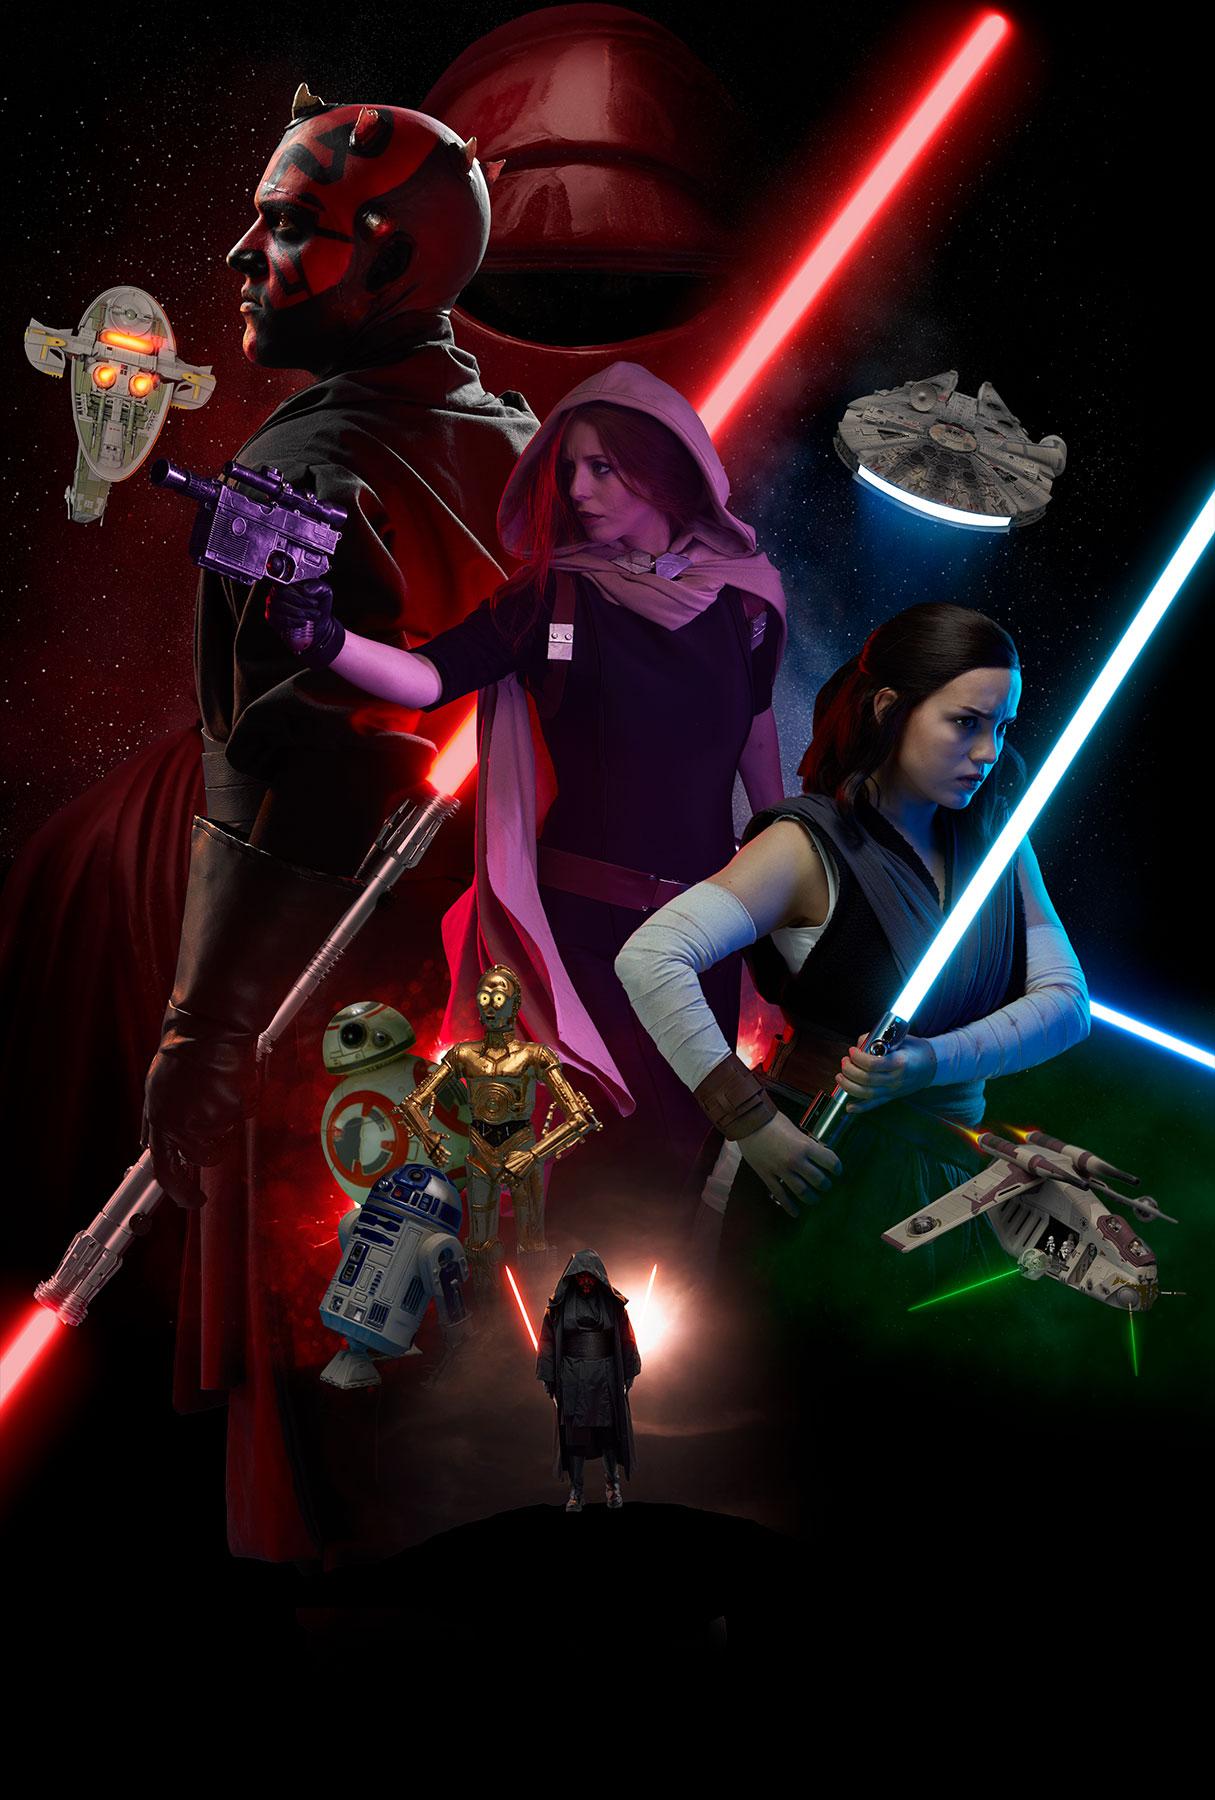 Sayanoff Arthur Star Wars Poster 02 03